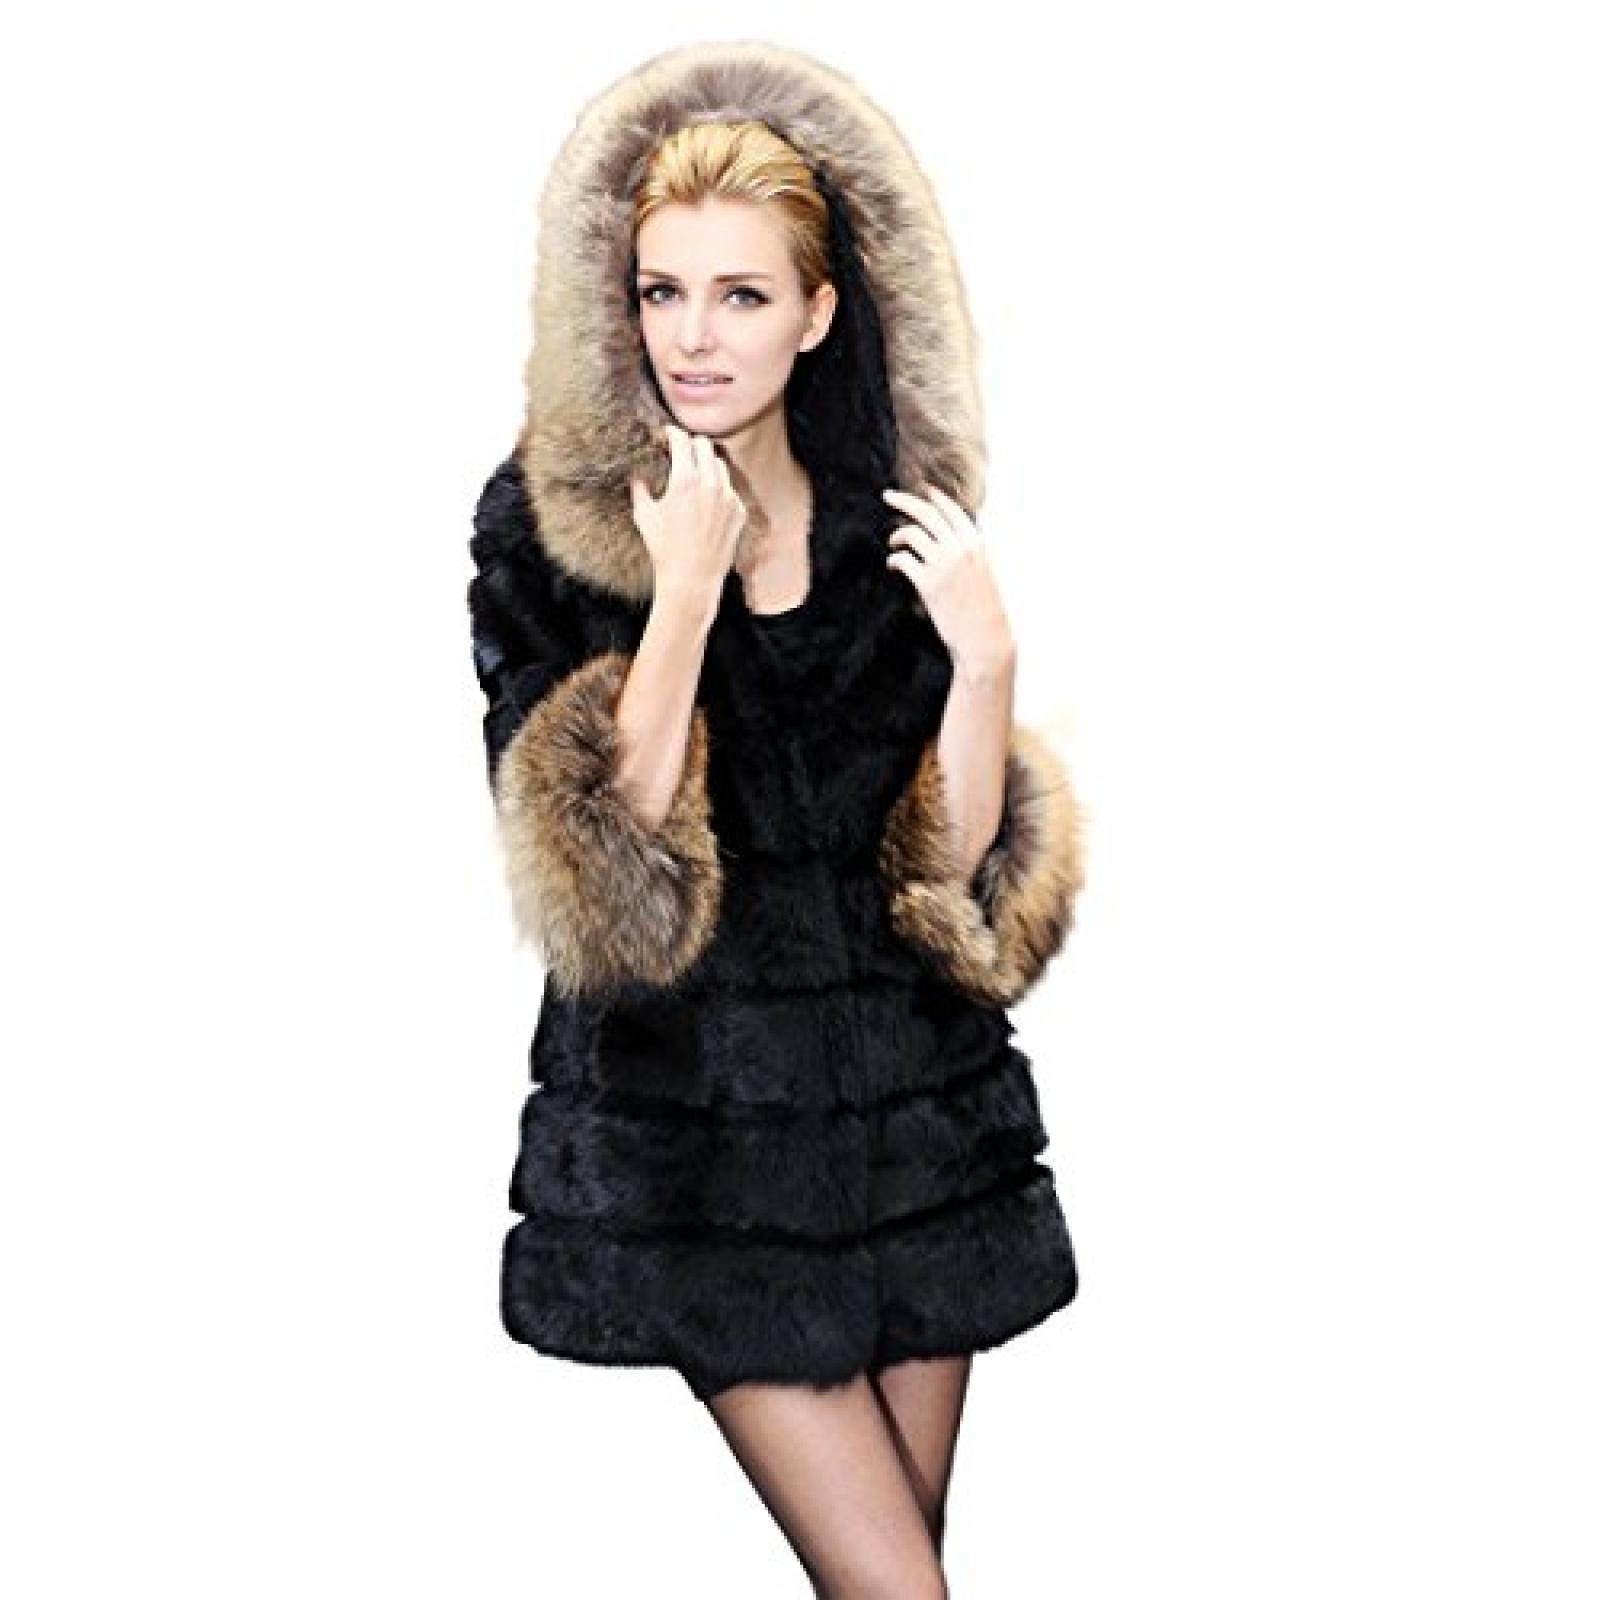 Imixlot Frauen Mittel Lang Rabbit Fur Coat Hoodie Jacke mit Kapuze Weste/Vest Oberbekleidung